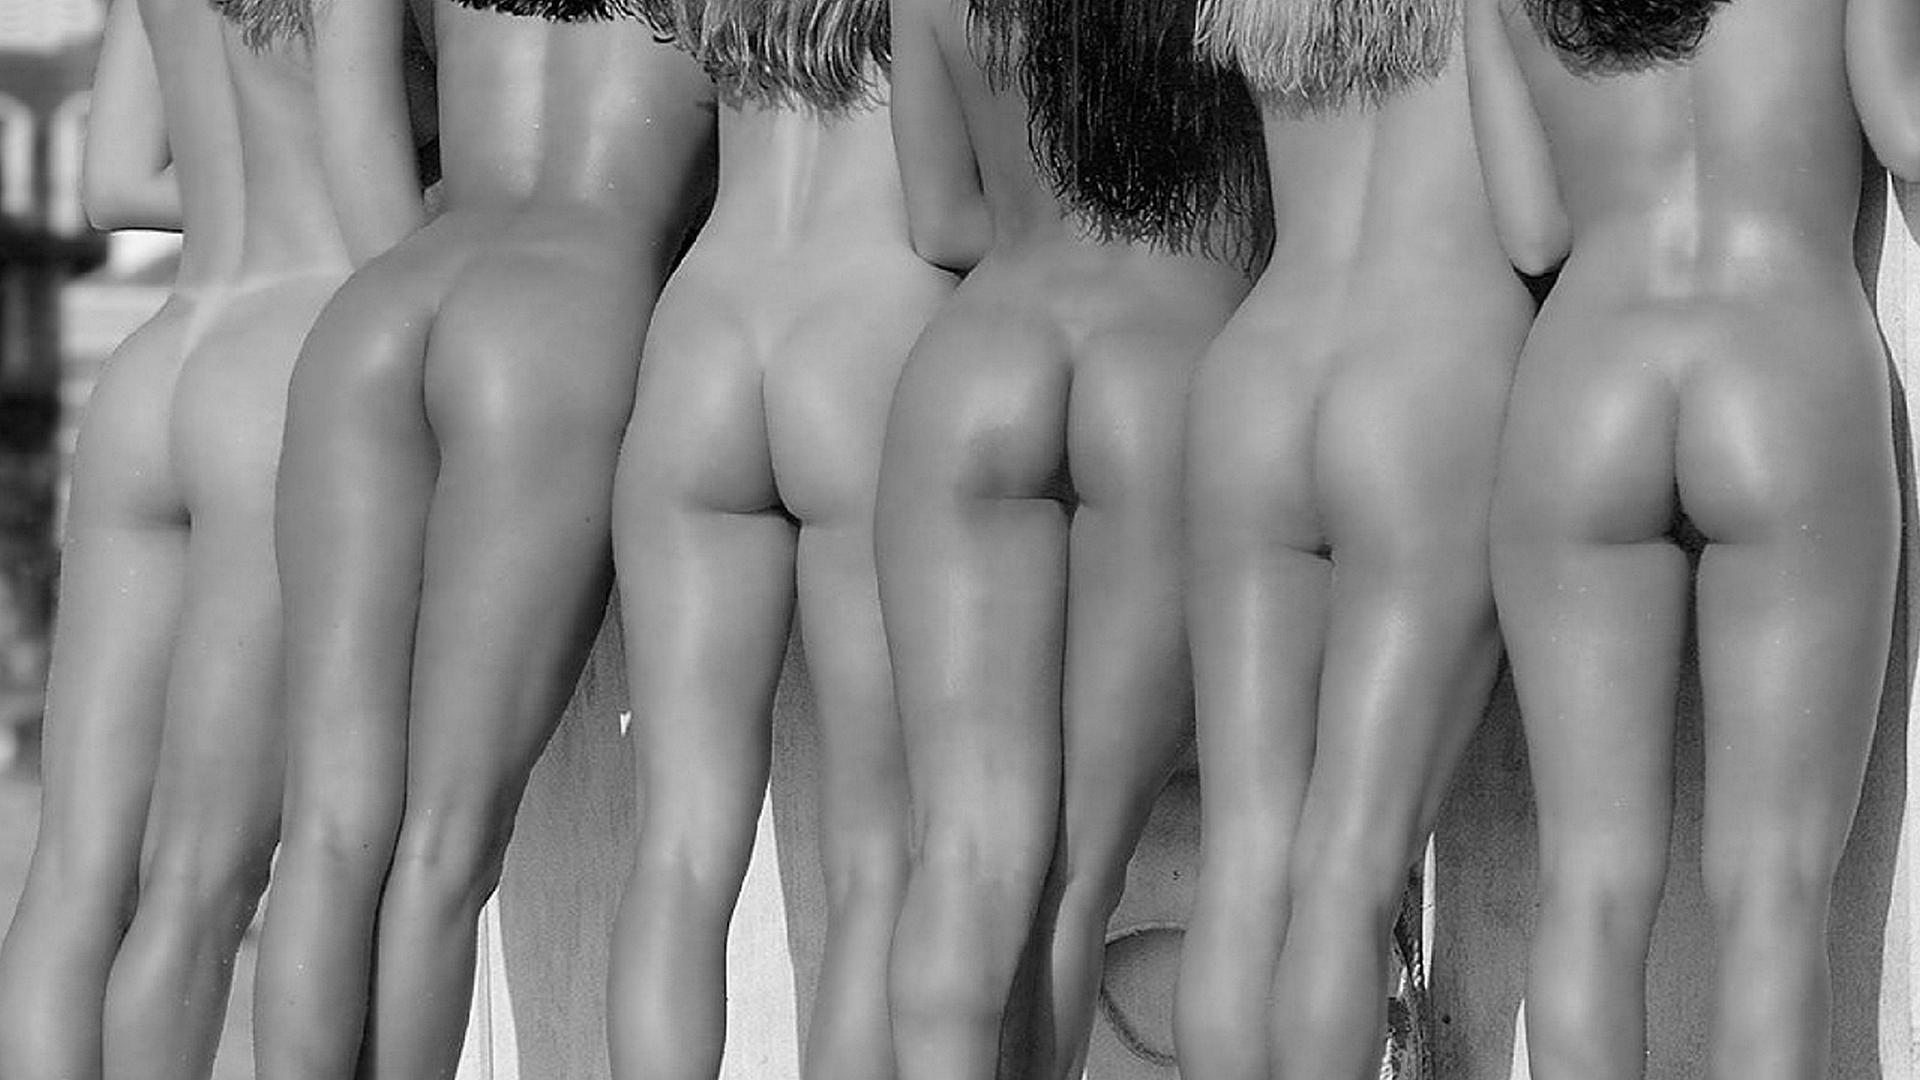 жопа.фото голая